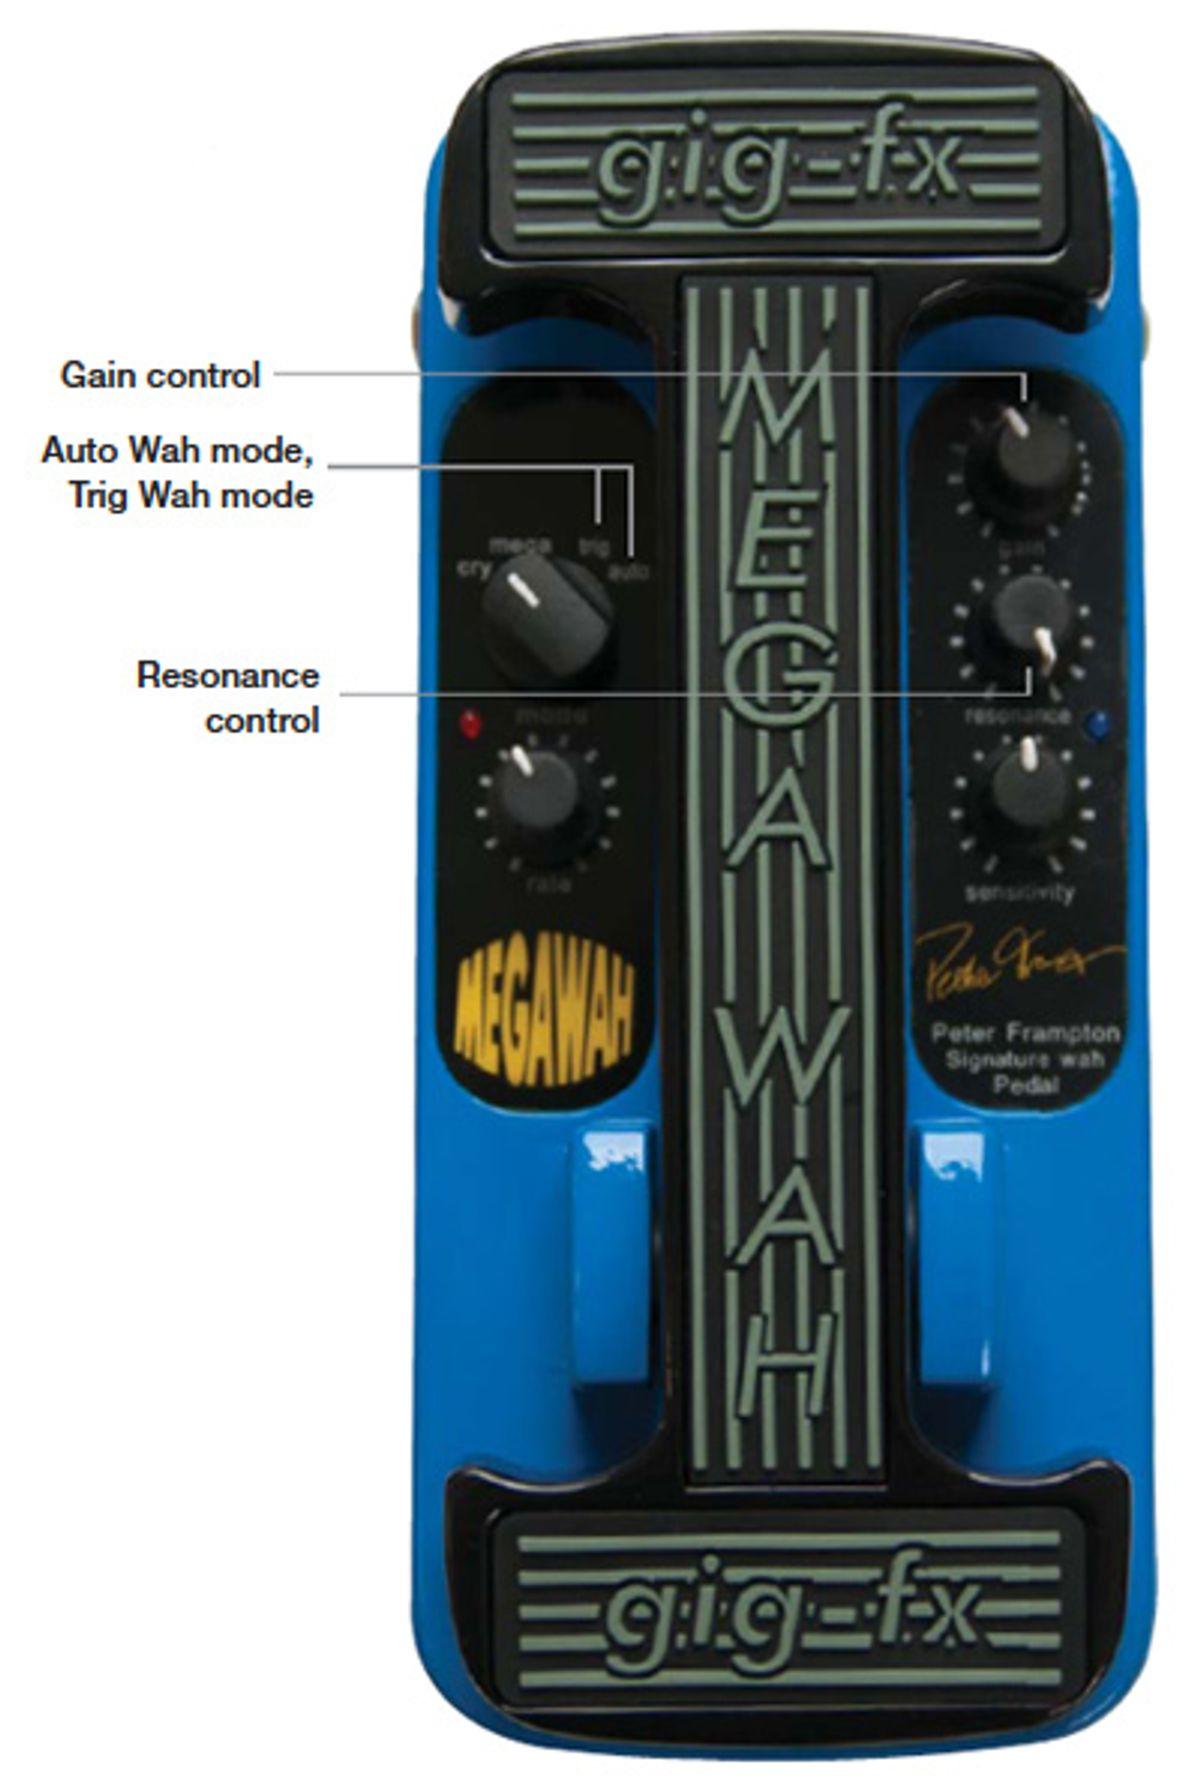 Gig-FX Peter Frampton MegaWah Pedal Review